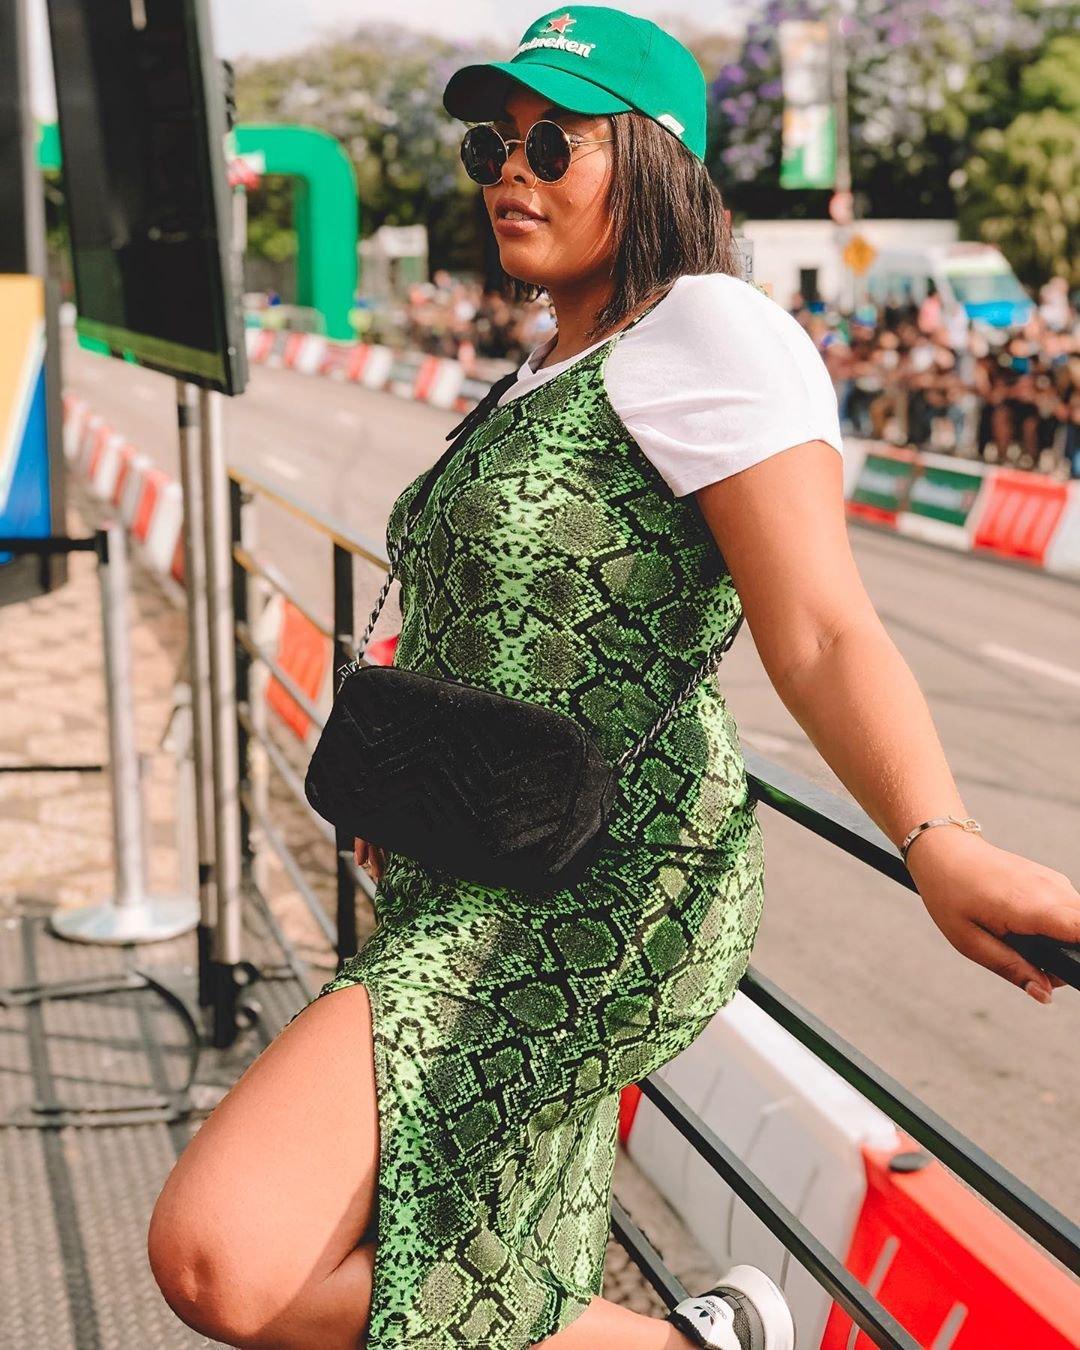 It girls - Carnaval - Carnaval - Verão - Street Style